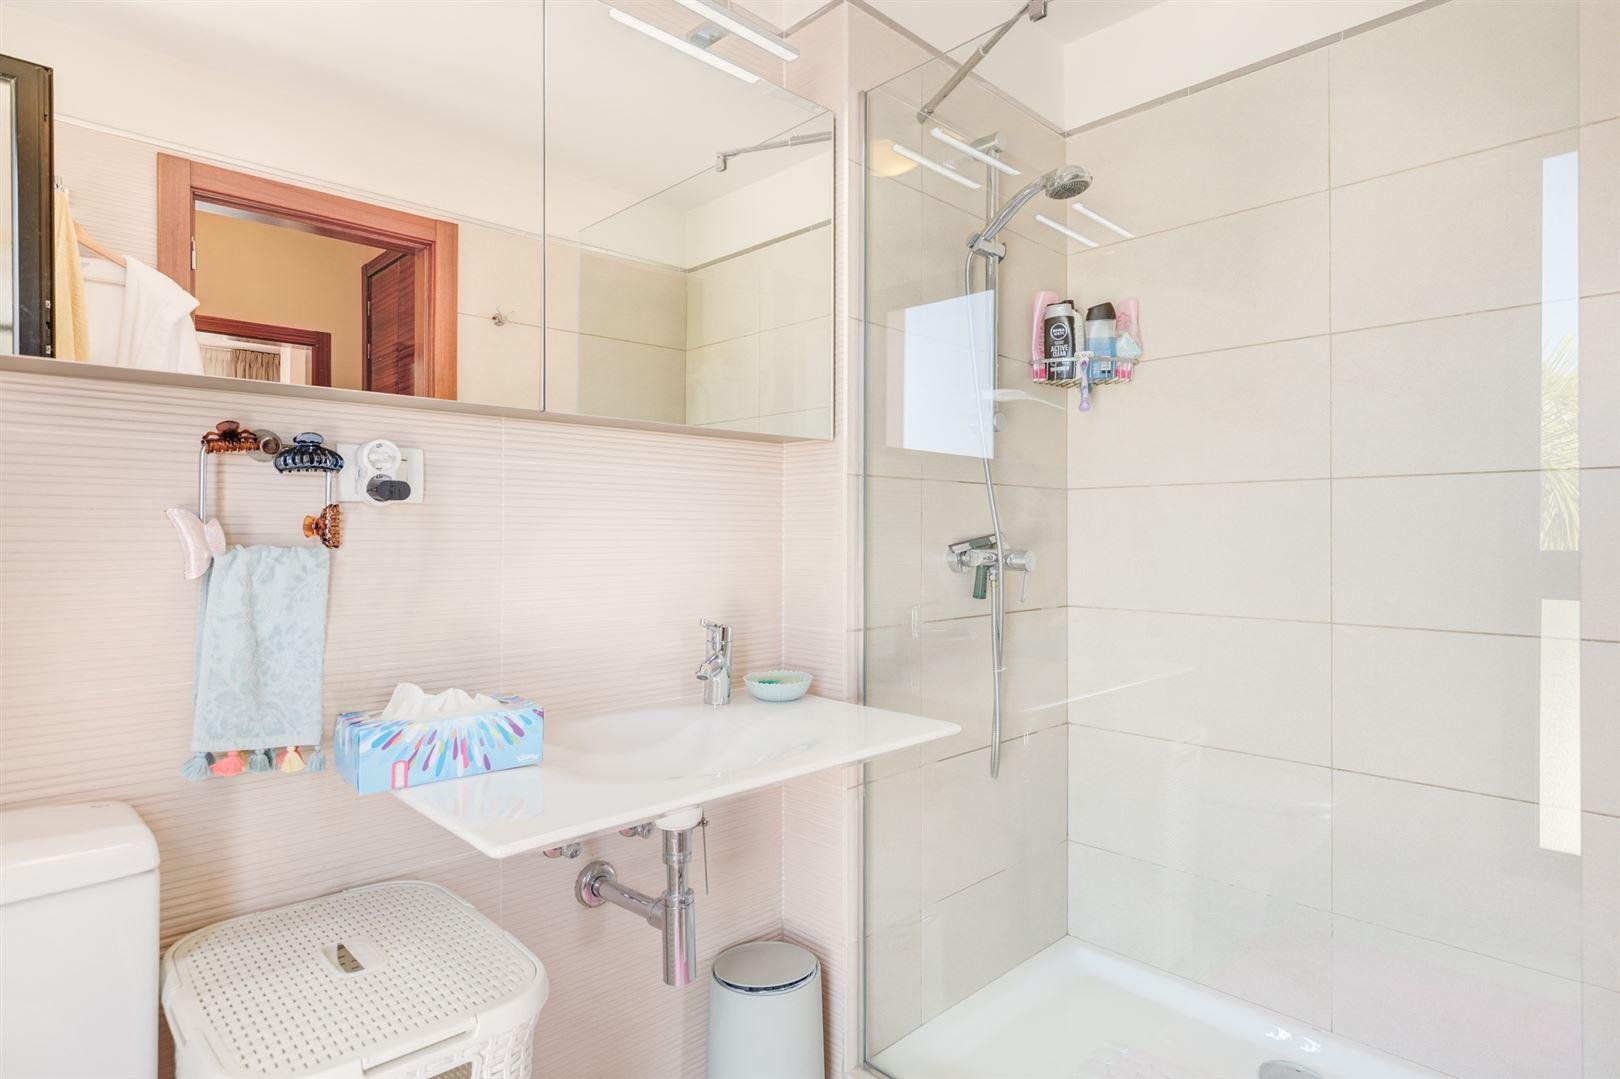 Foto 12 : Appartement te  TENERIFE (Spanje) - Prijs € 645.000